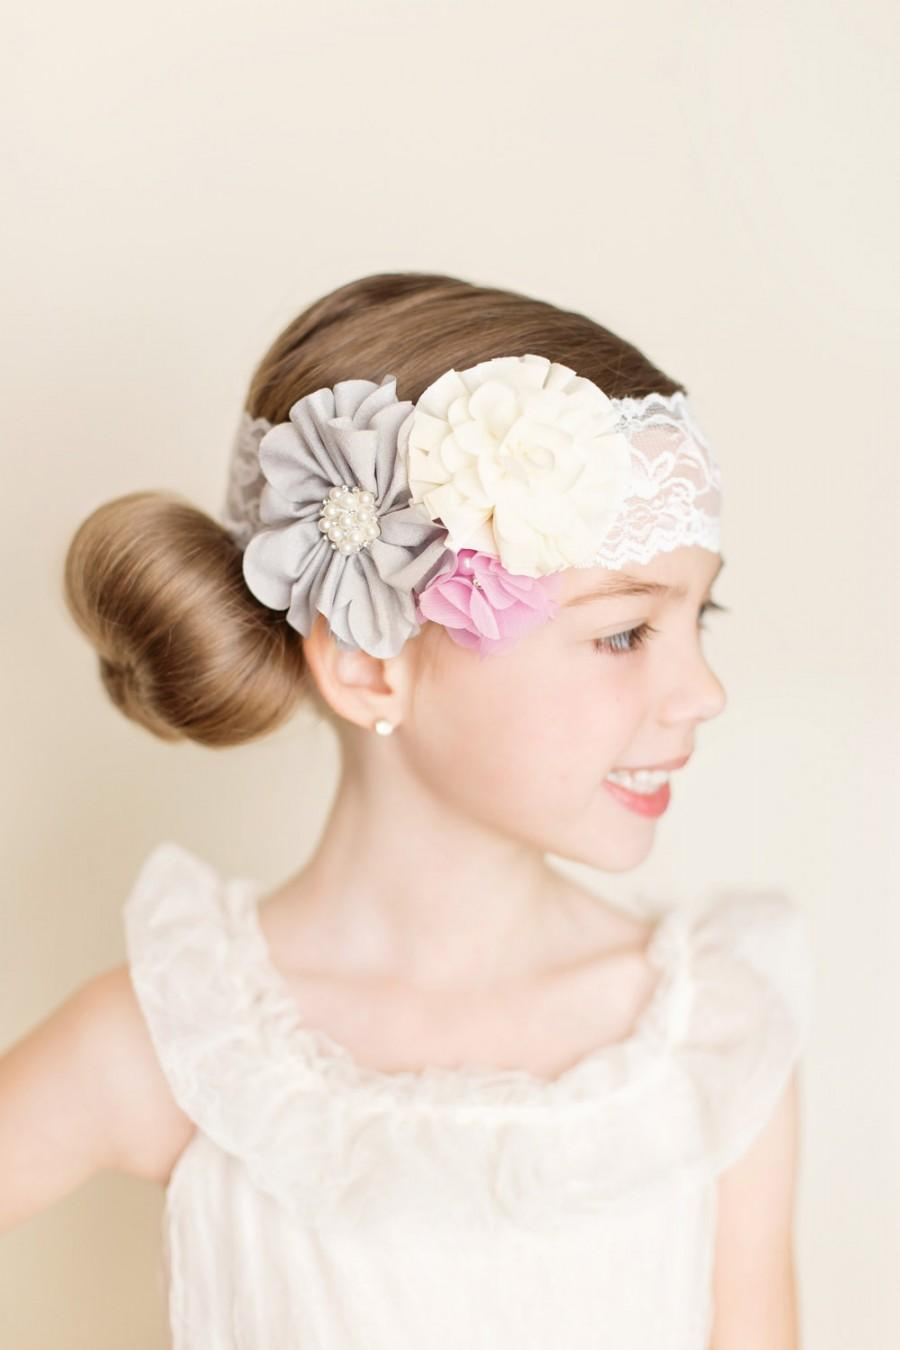 Hochzeit - Violet Blush Headband, Flower Girl Headband, Ivory Violet Grey, Ivory Pearl Headband, Romantic Hair, Bridal Hair, Wedding Headband